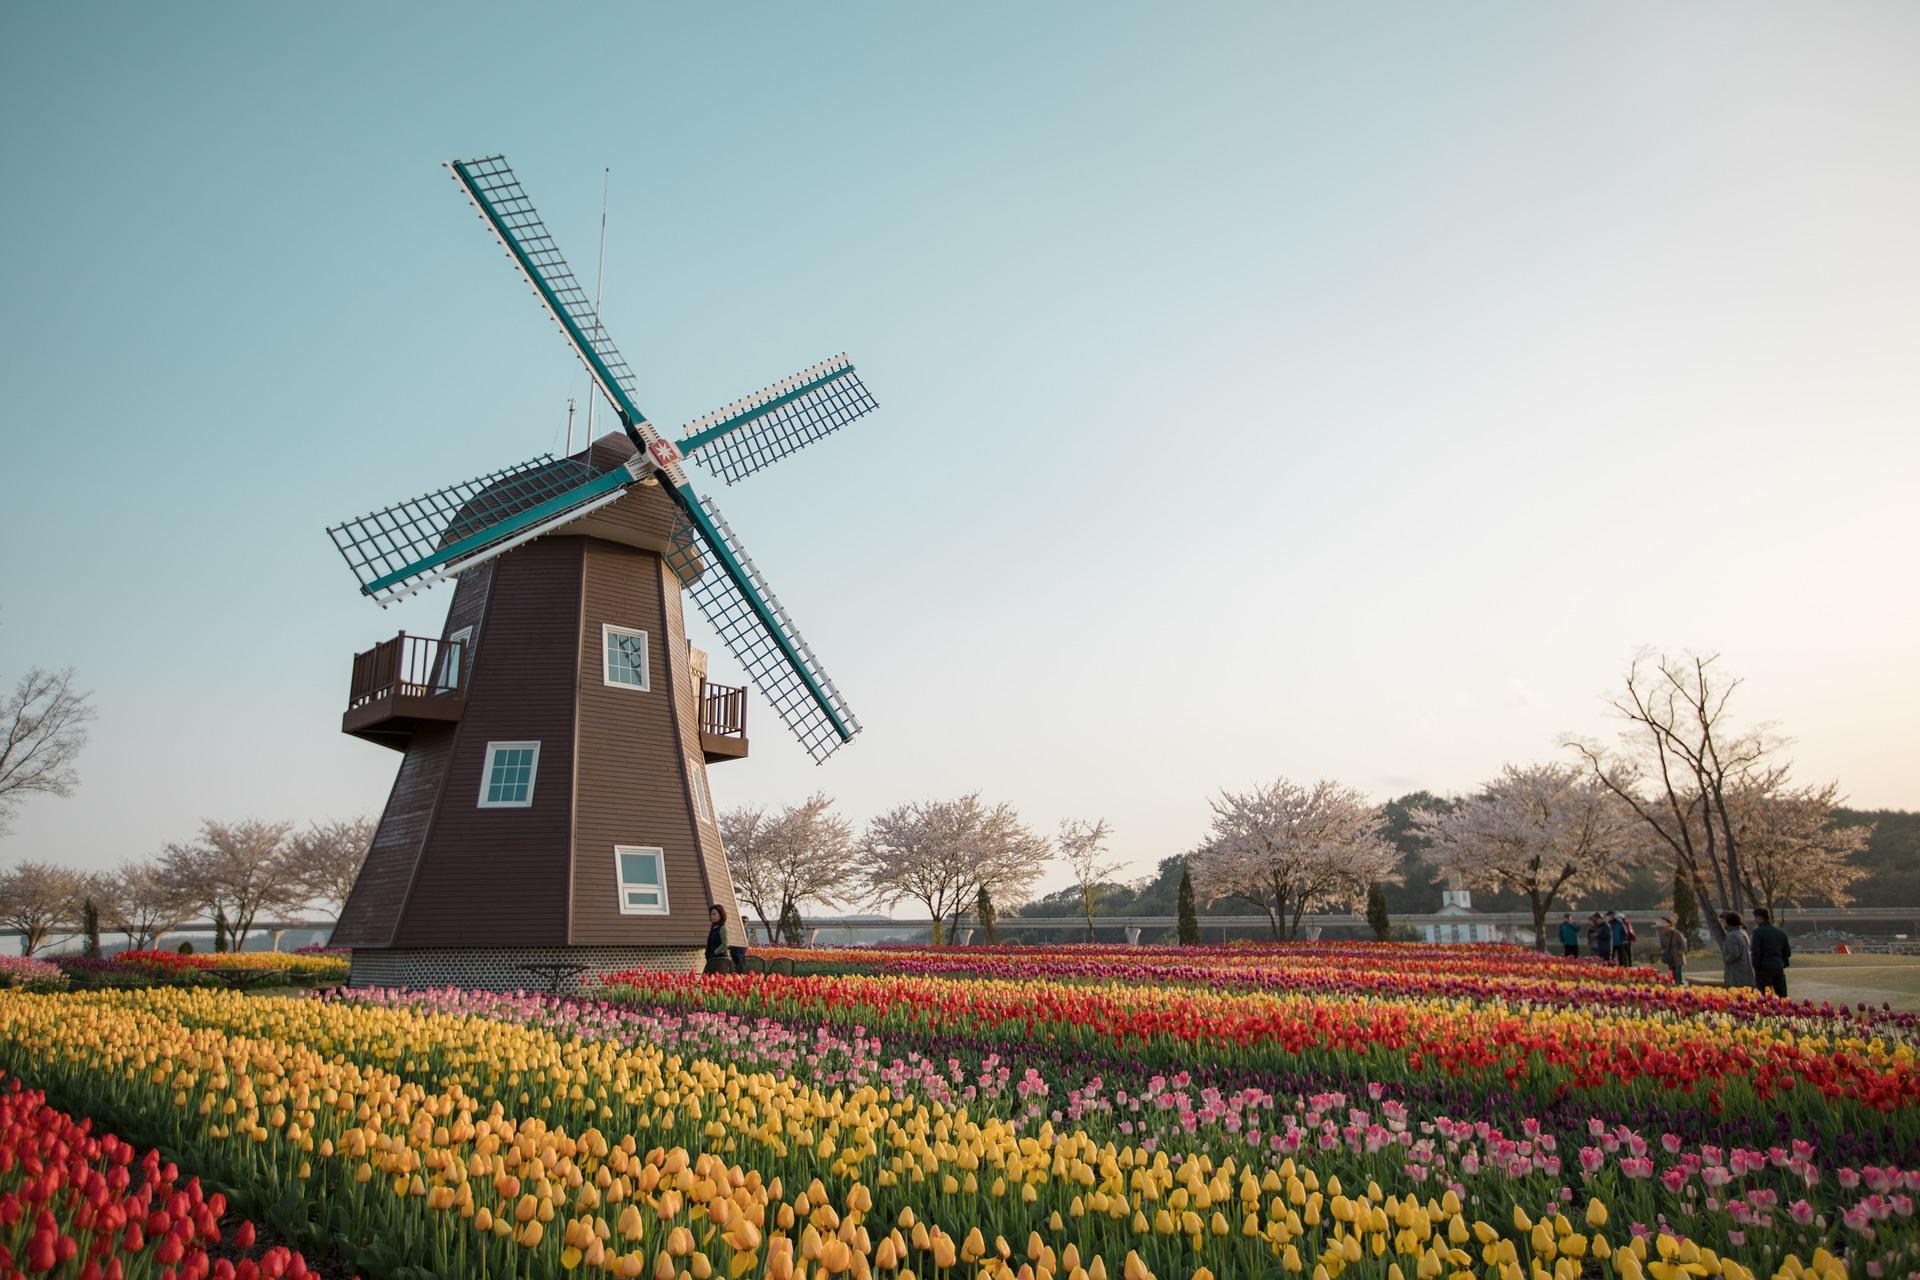 Dutch appeal for help in building online memorial